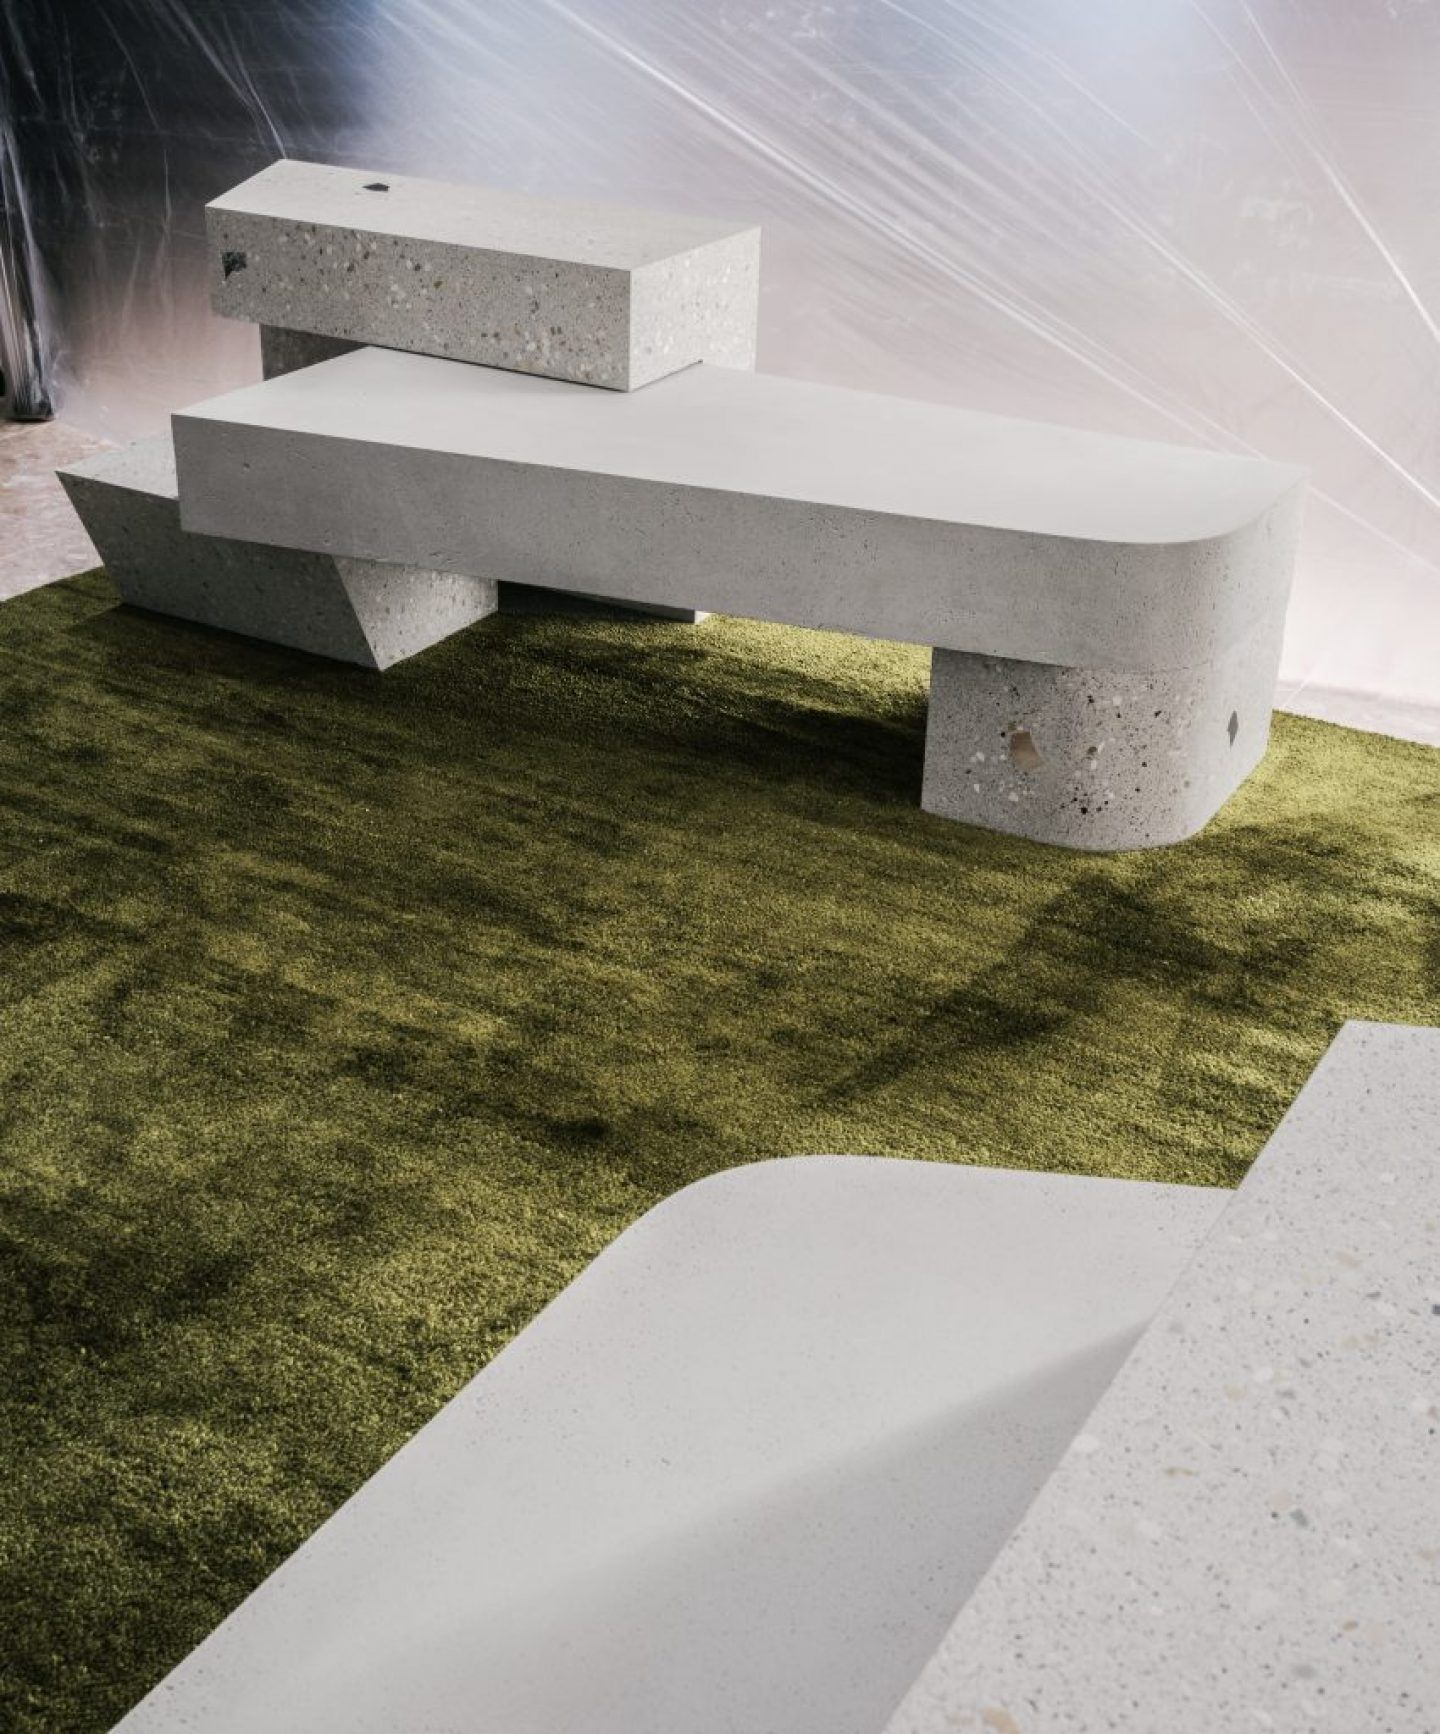 IGNANT-Design-Interior-Al-Jawad-Pike-Celine-Store-15